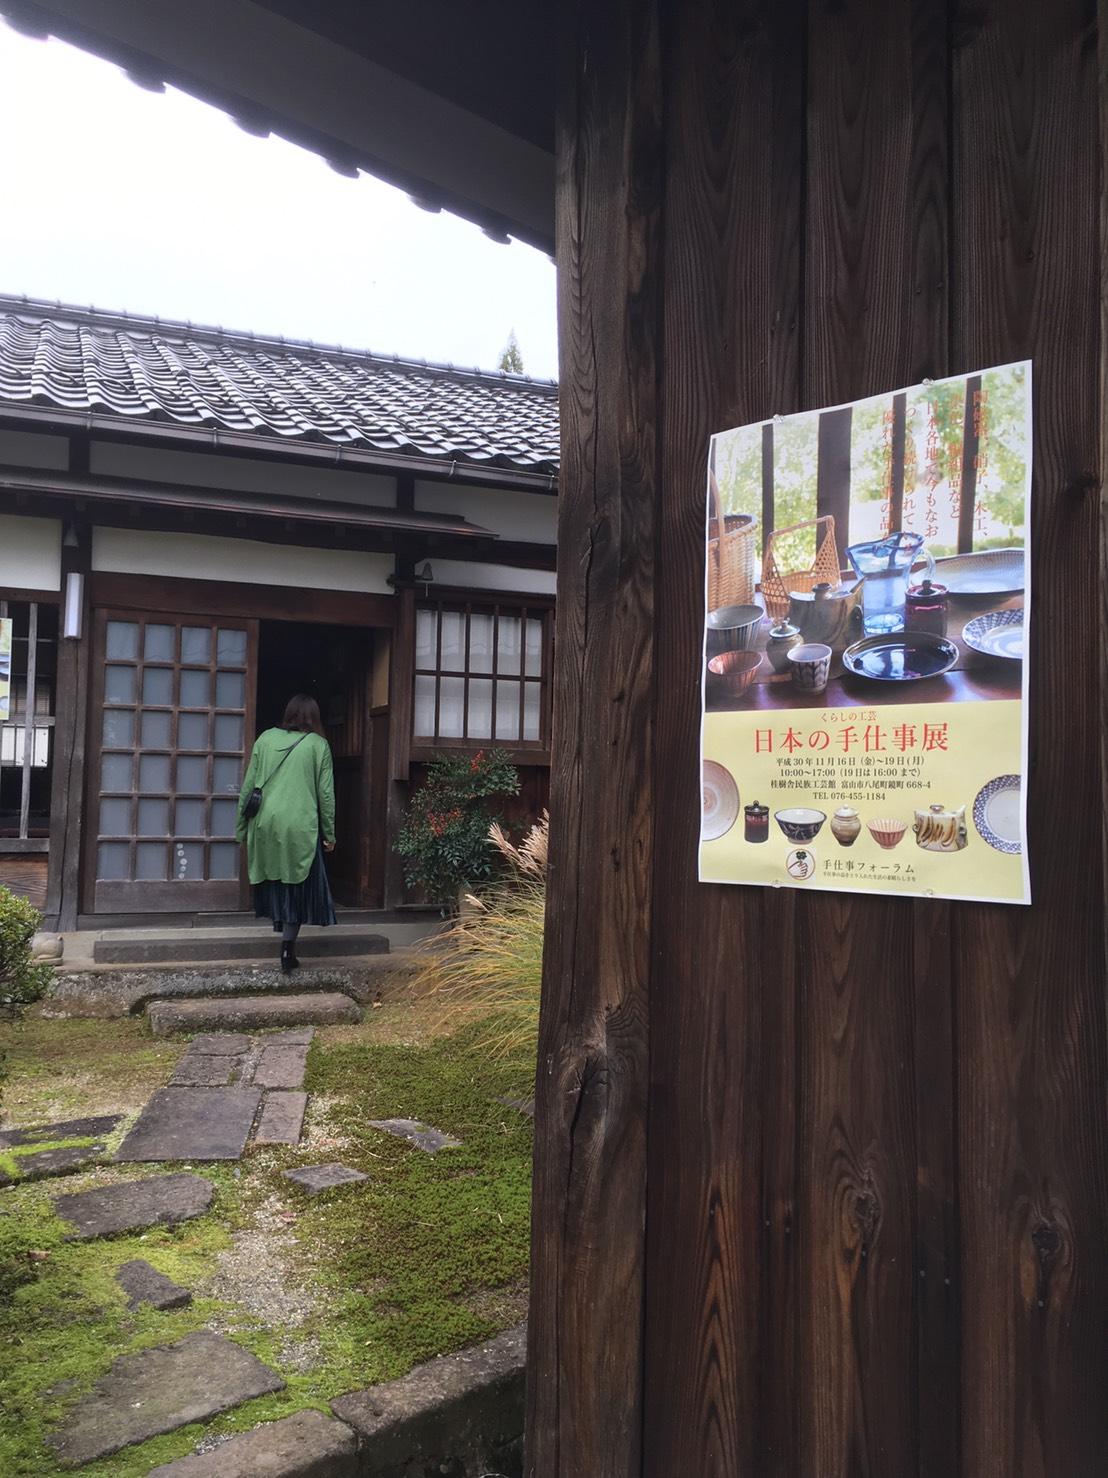 https://n-ko.jp/staffblog/hn-1120-1.jpg